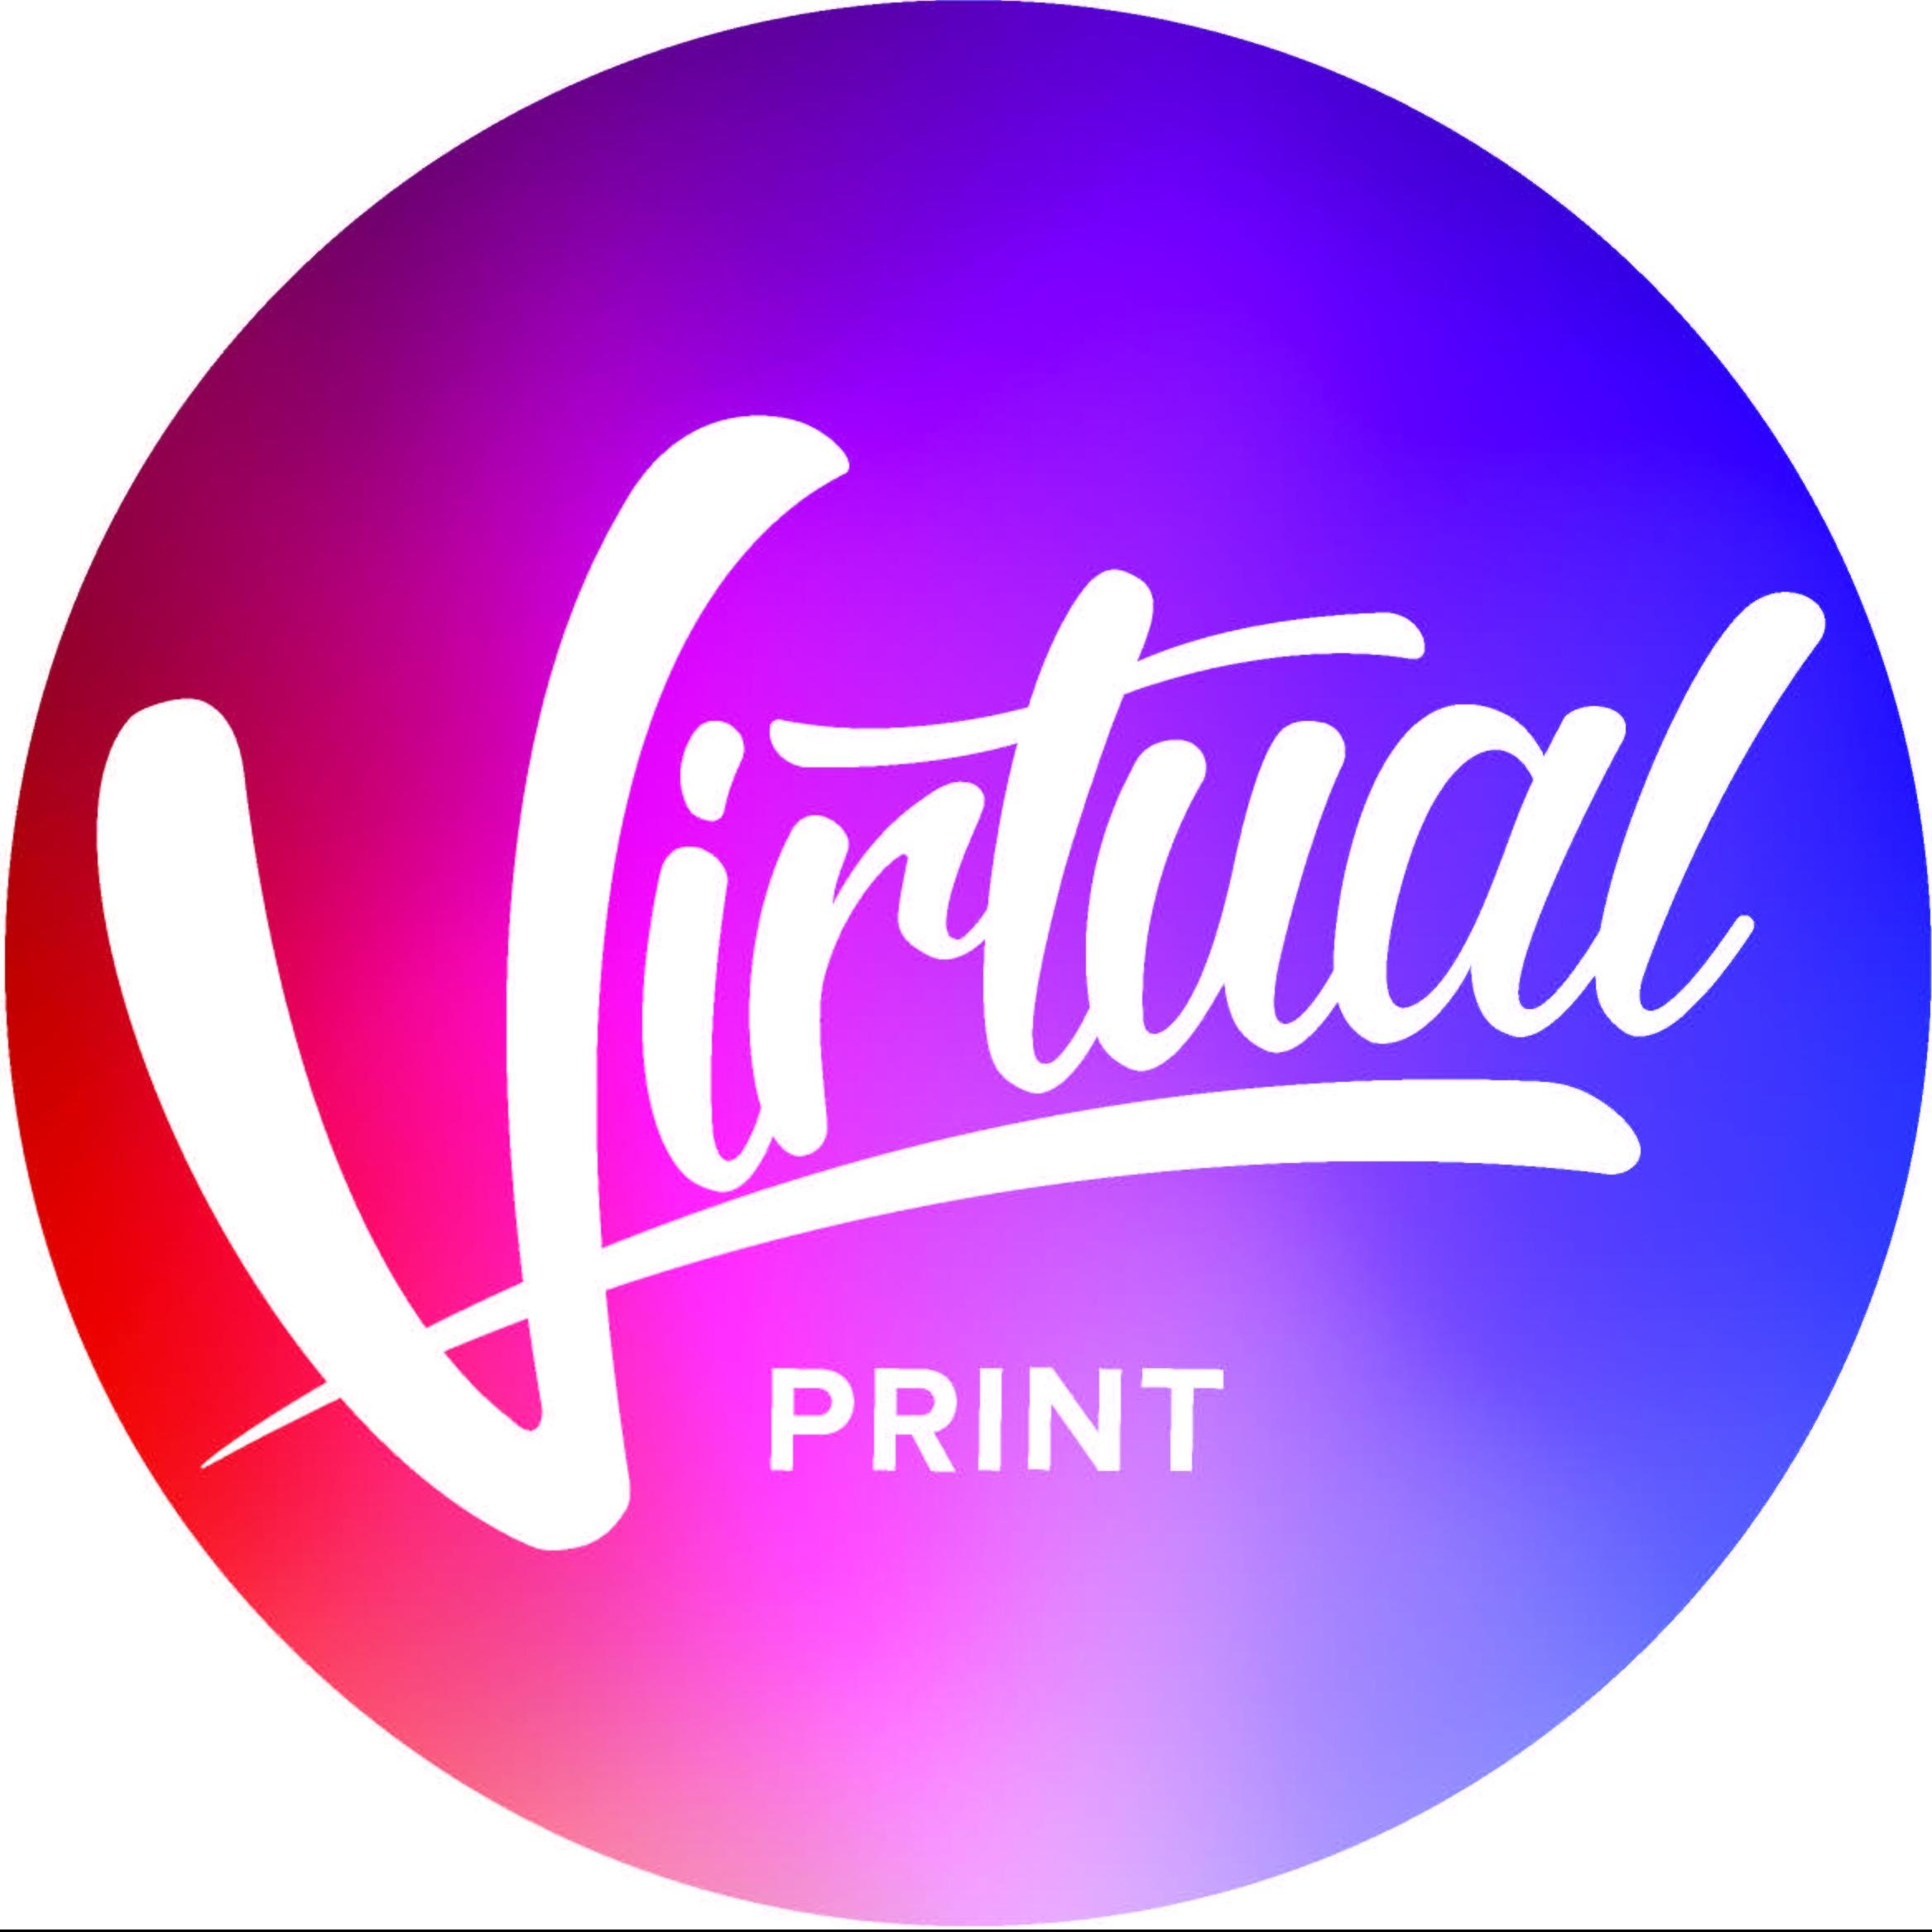 Virtual Print Limited